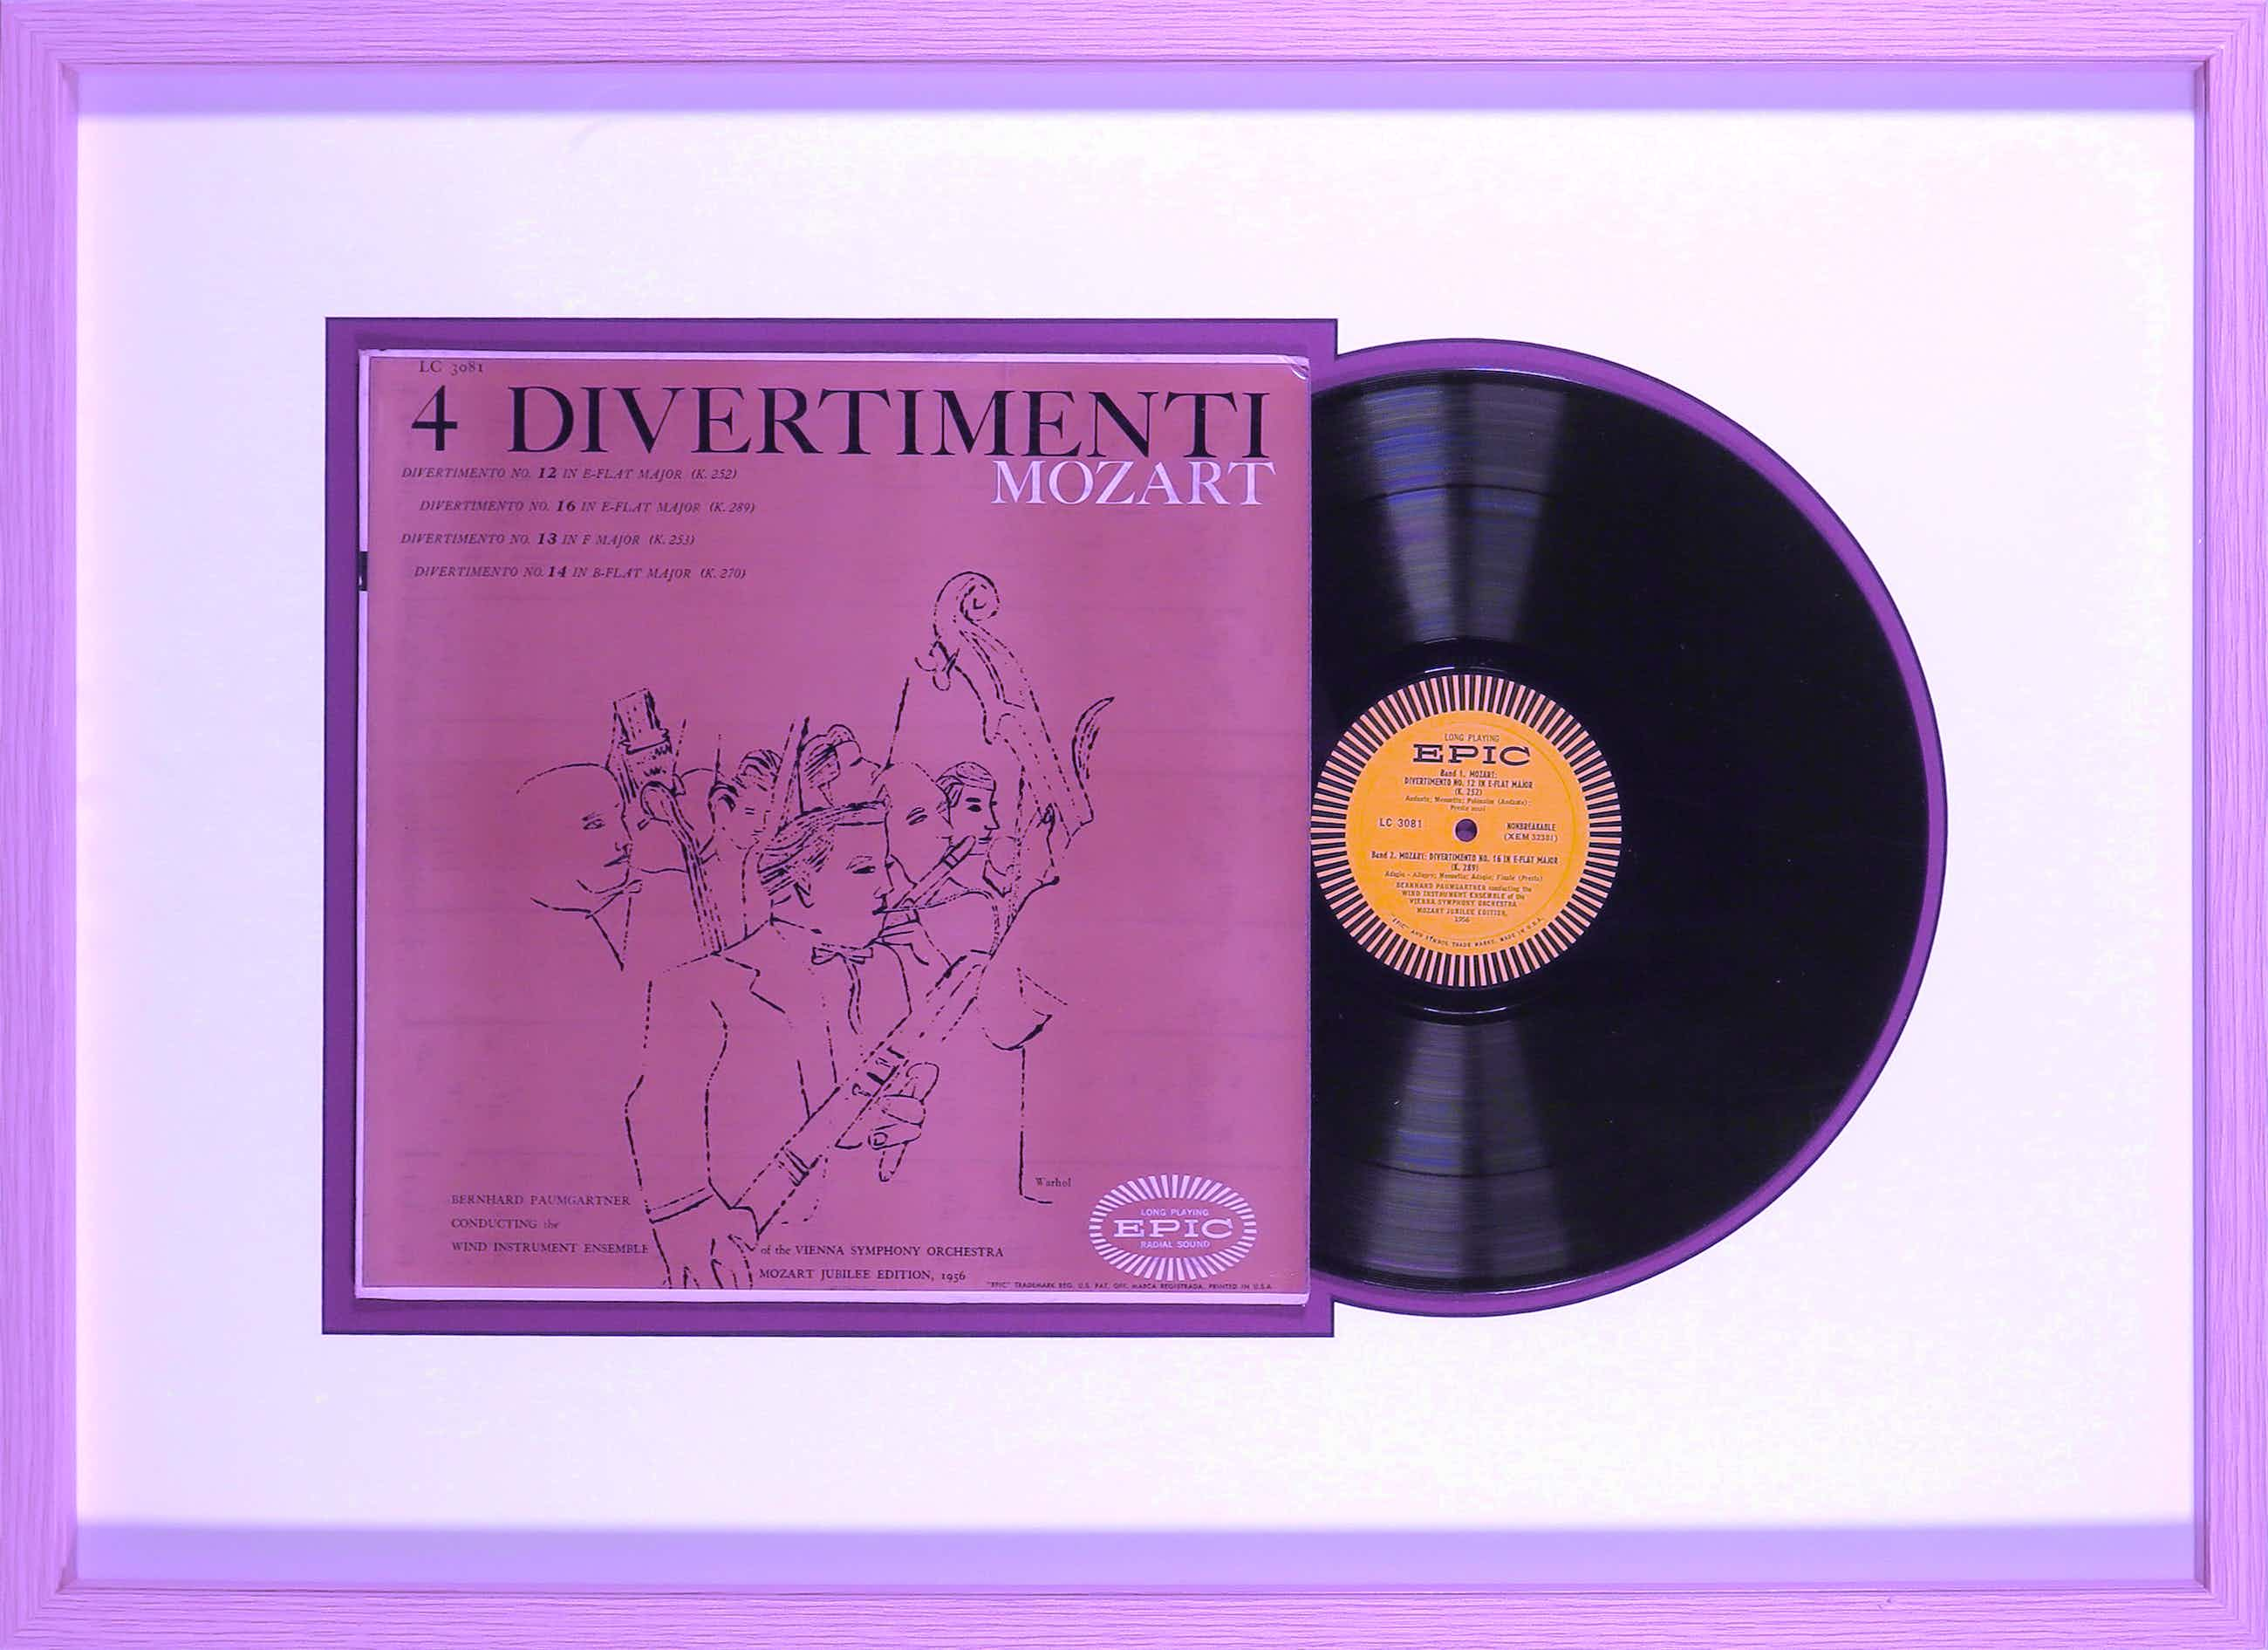 Andy Warhol - 4 Divertimenti Mozart Jubilee Edition - Vienna Symphony Orchestra - Ingelijst kopen? Bied vanaf 272!